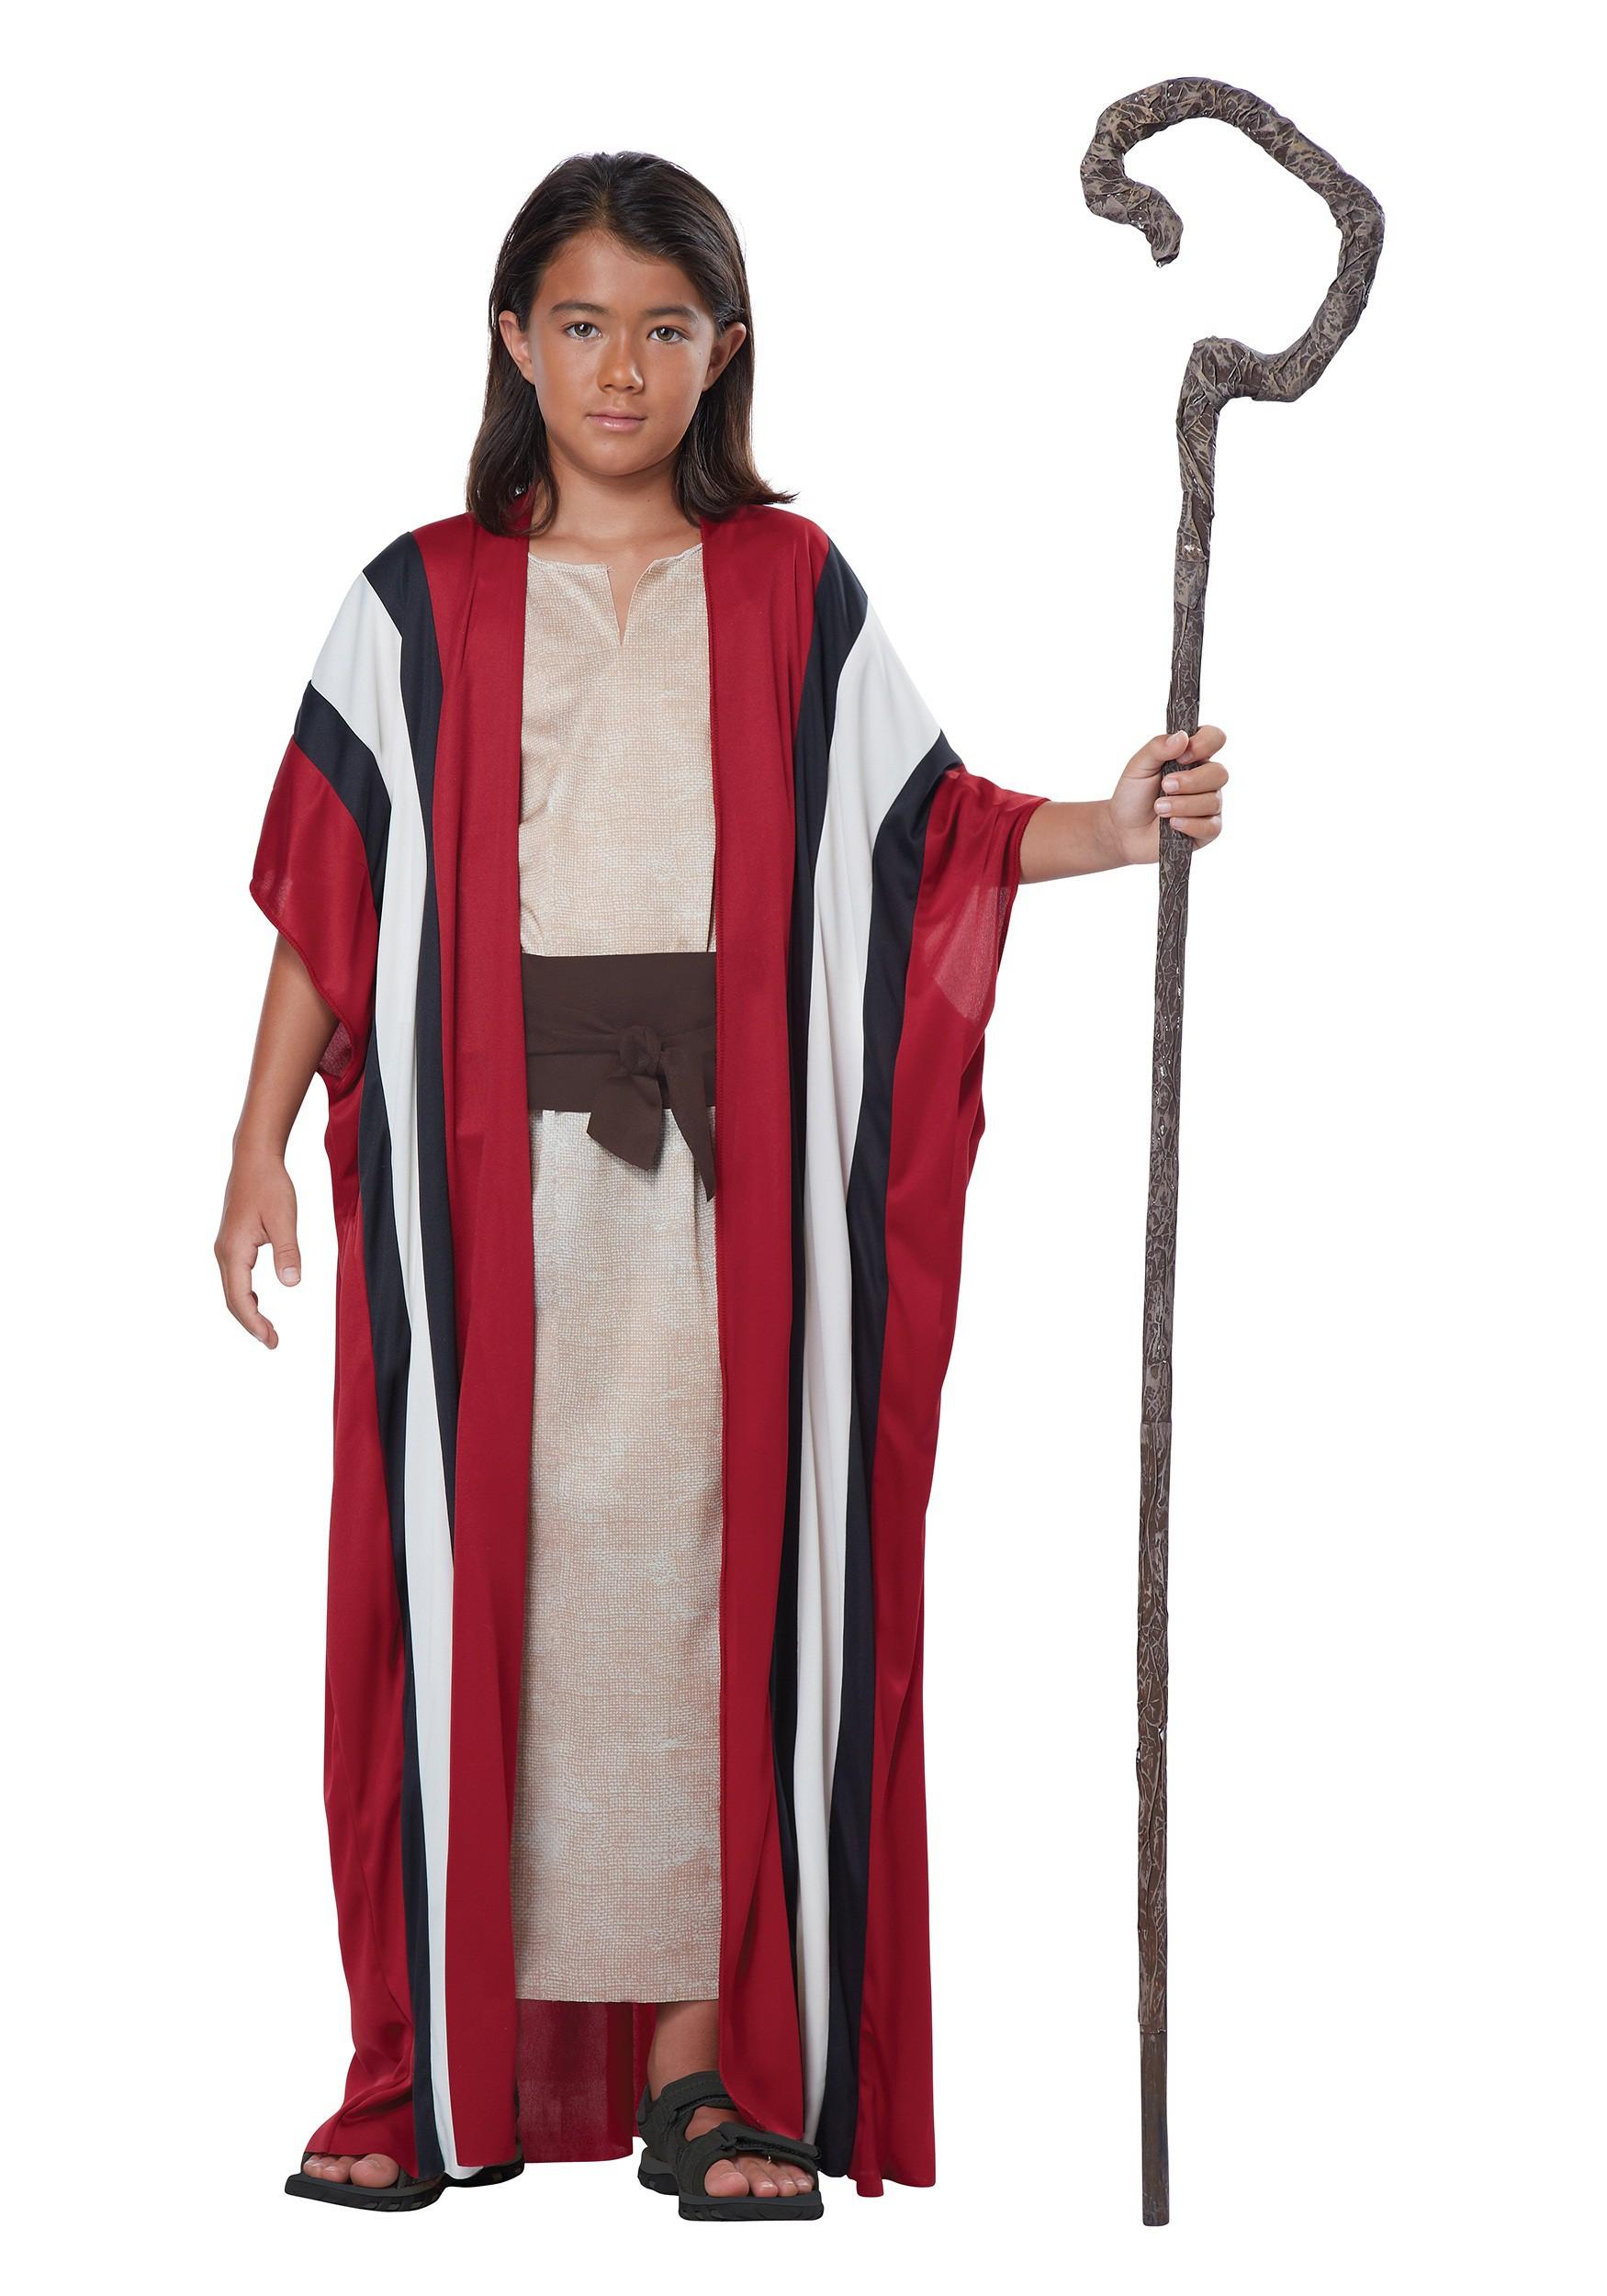 kids religion costumes child religious costume